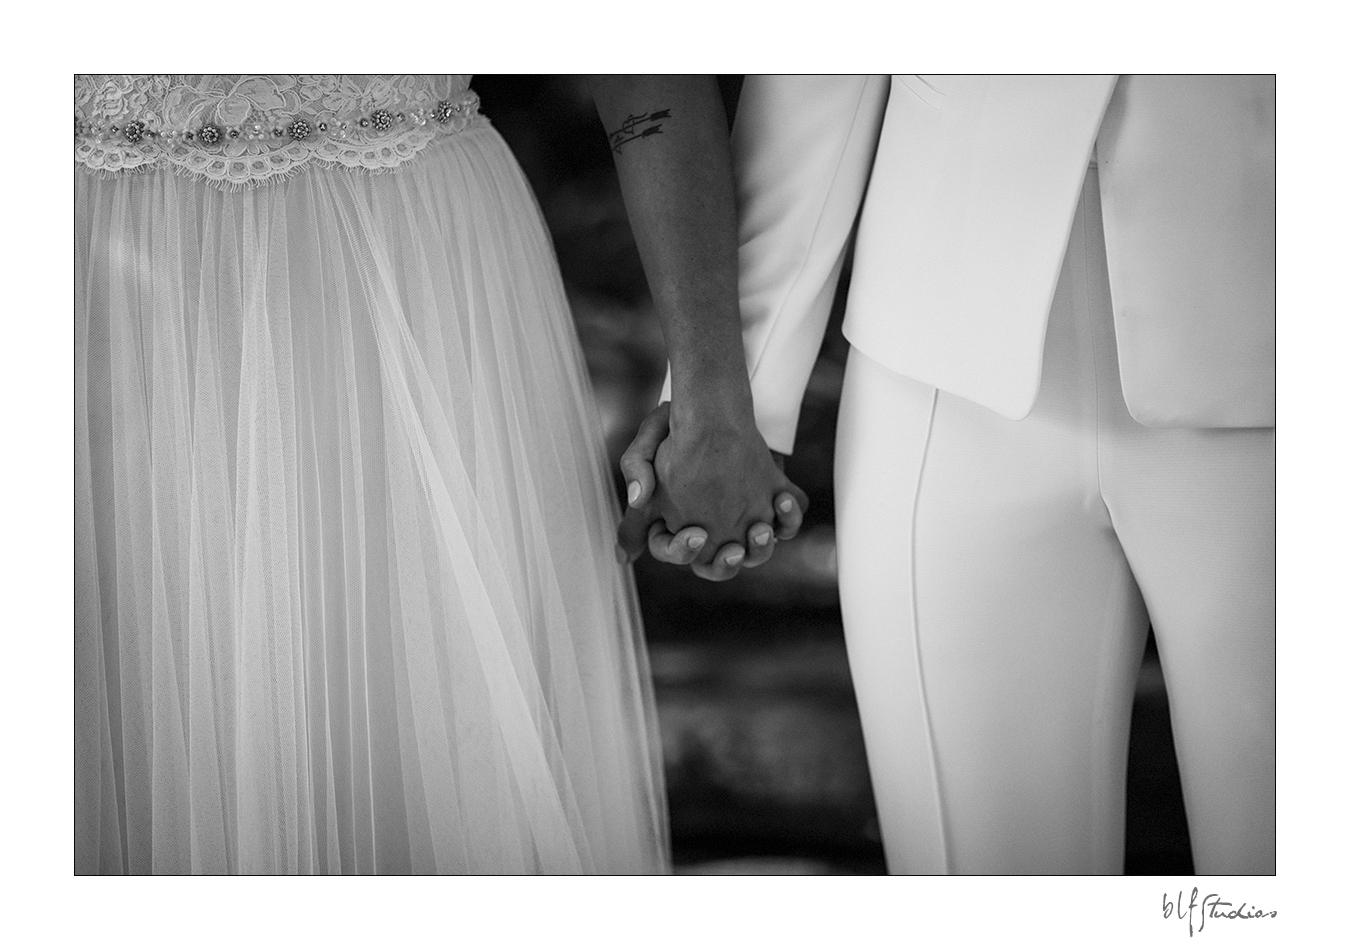 016-winnipeg-hitchnpost-wedding-marla-alana.jpg